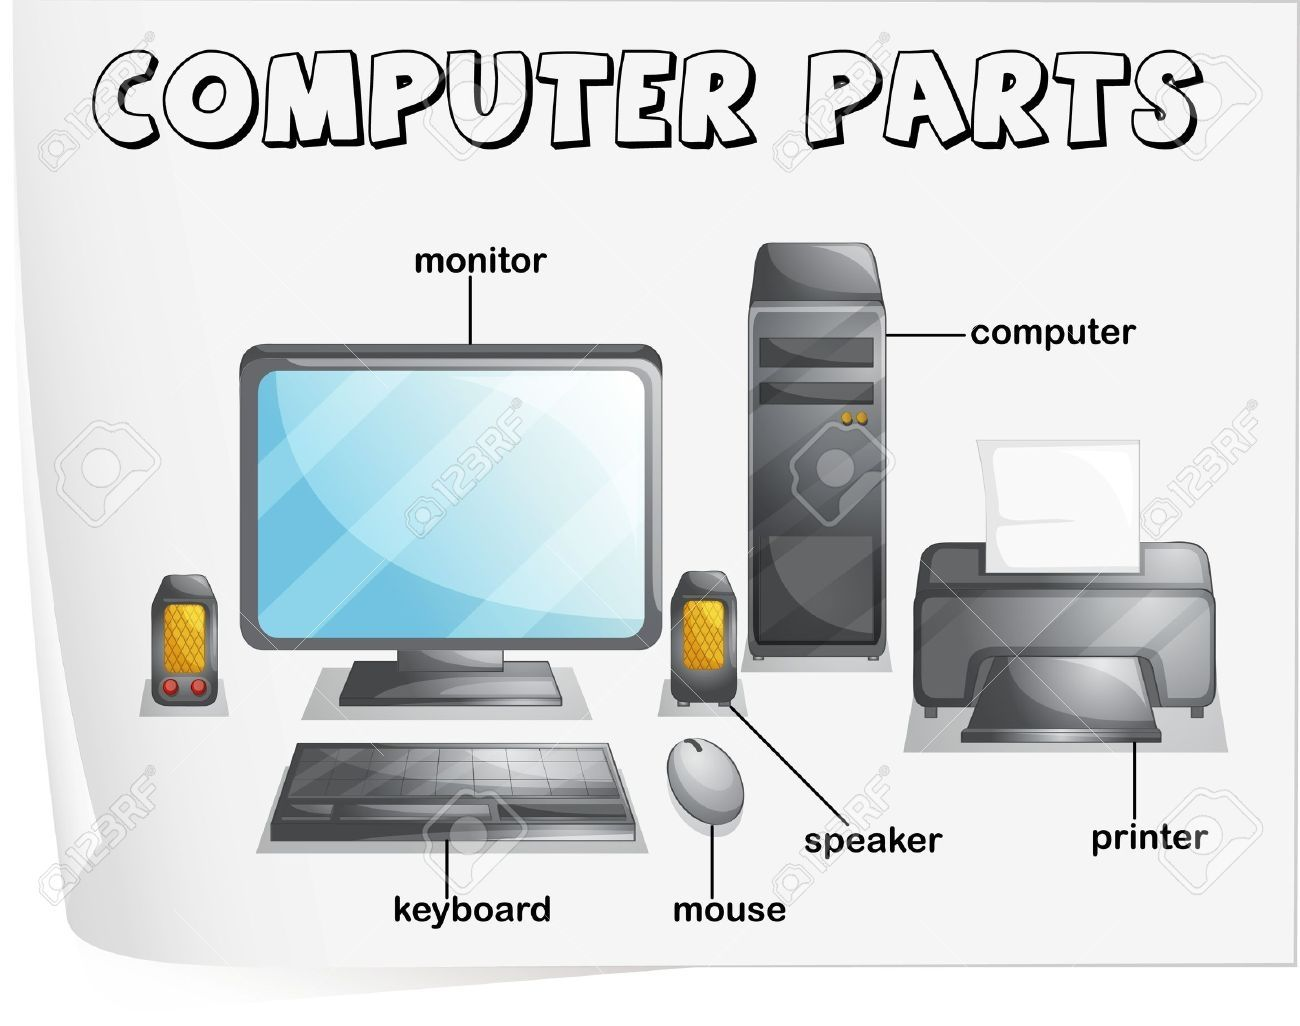 Worksheets Parts Of A Computer Worksheet image result for labeling computer parts technology pinterest illustration of worksheet stock photo